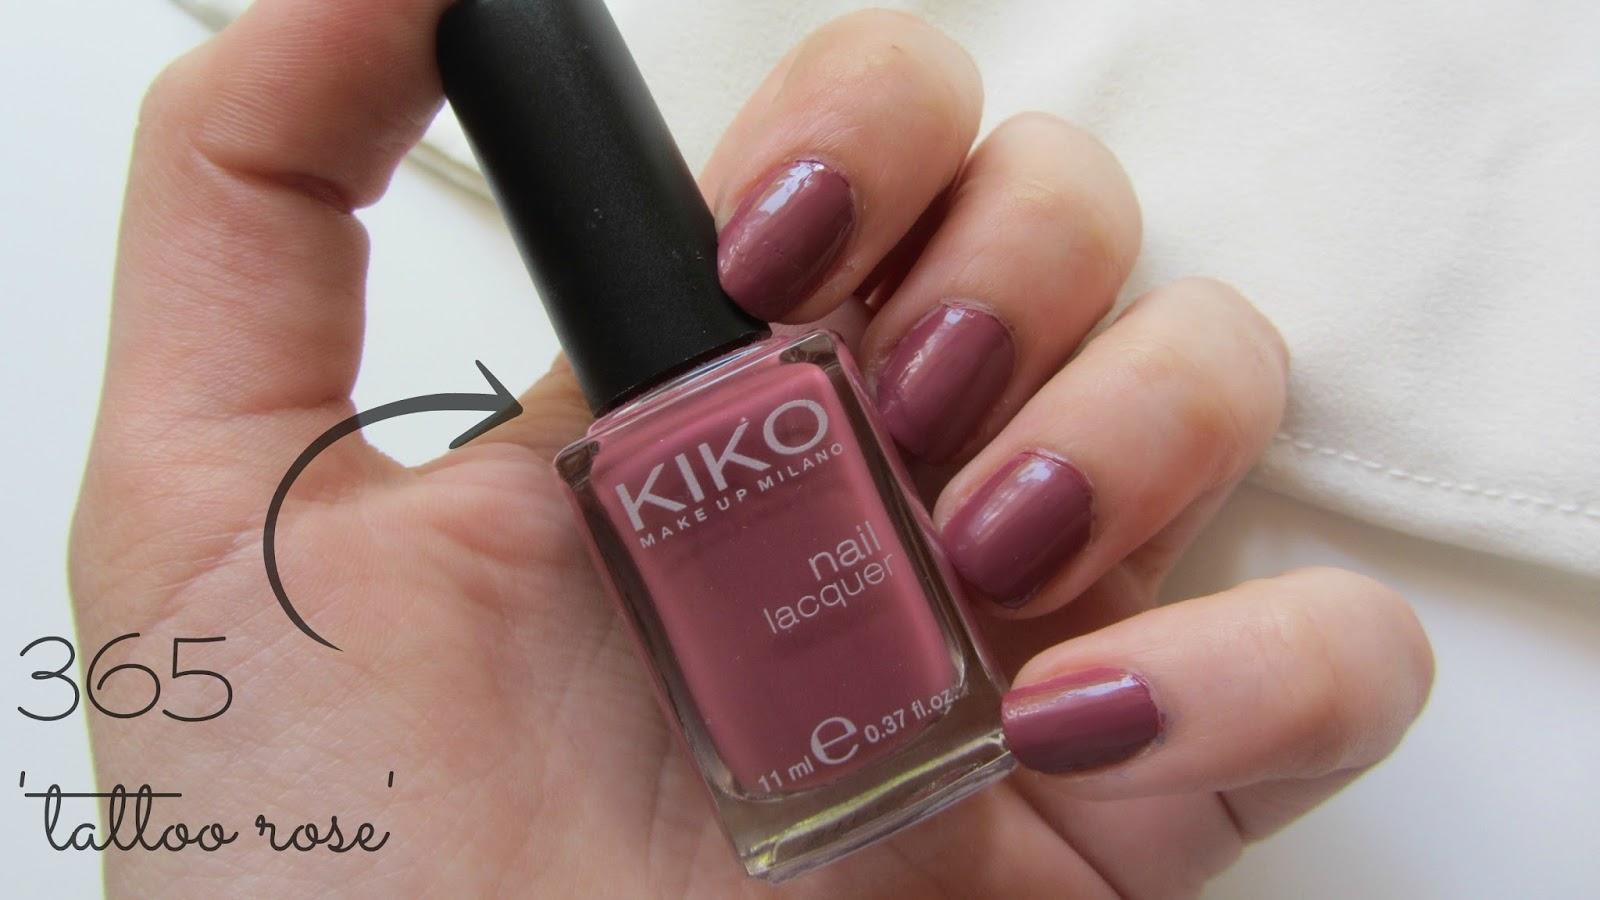 Misszickzack kiko haul 2015 for Kiko 365 tattoo rose